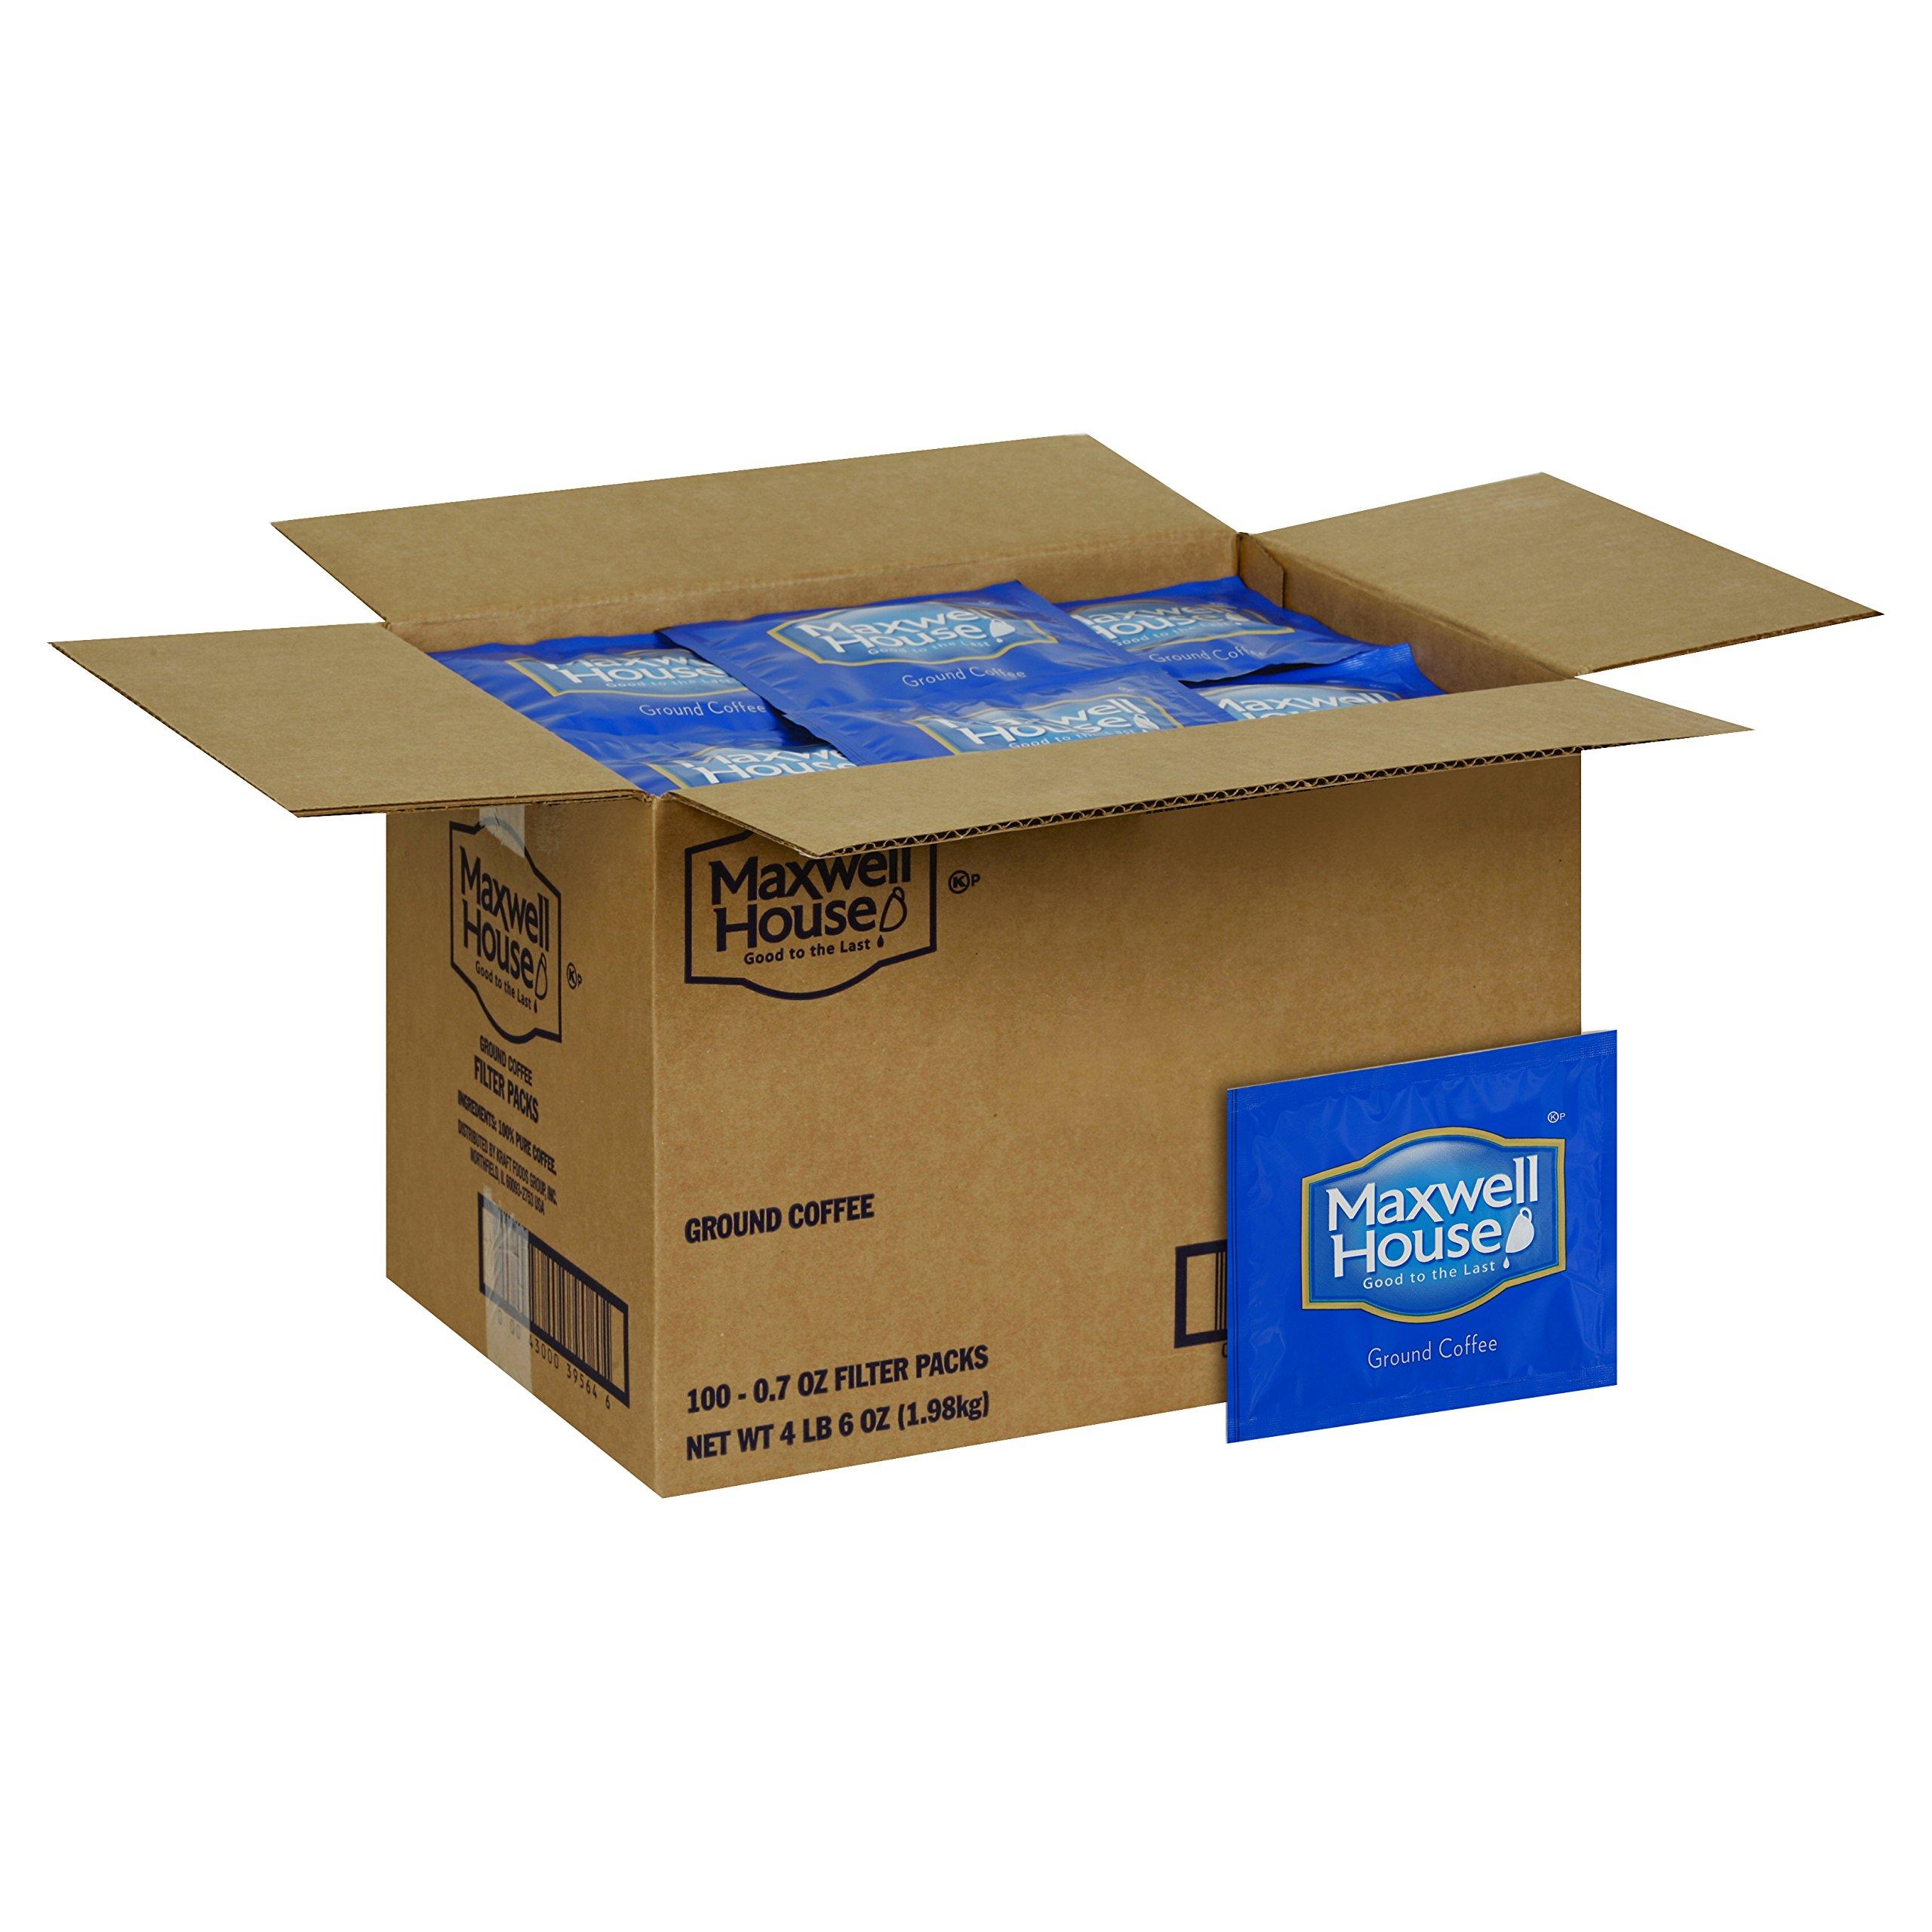 Maxwell House Roast & Ground In-Room Filer Coffee, 0.7 oz. pack, Pack of 100